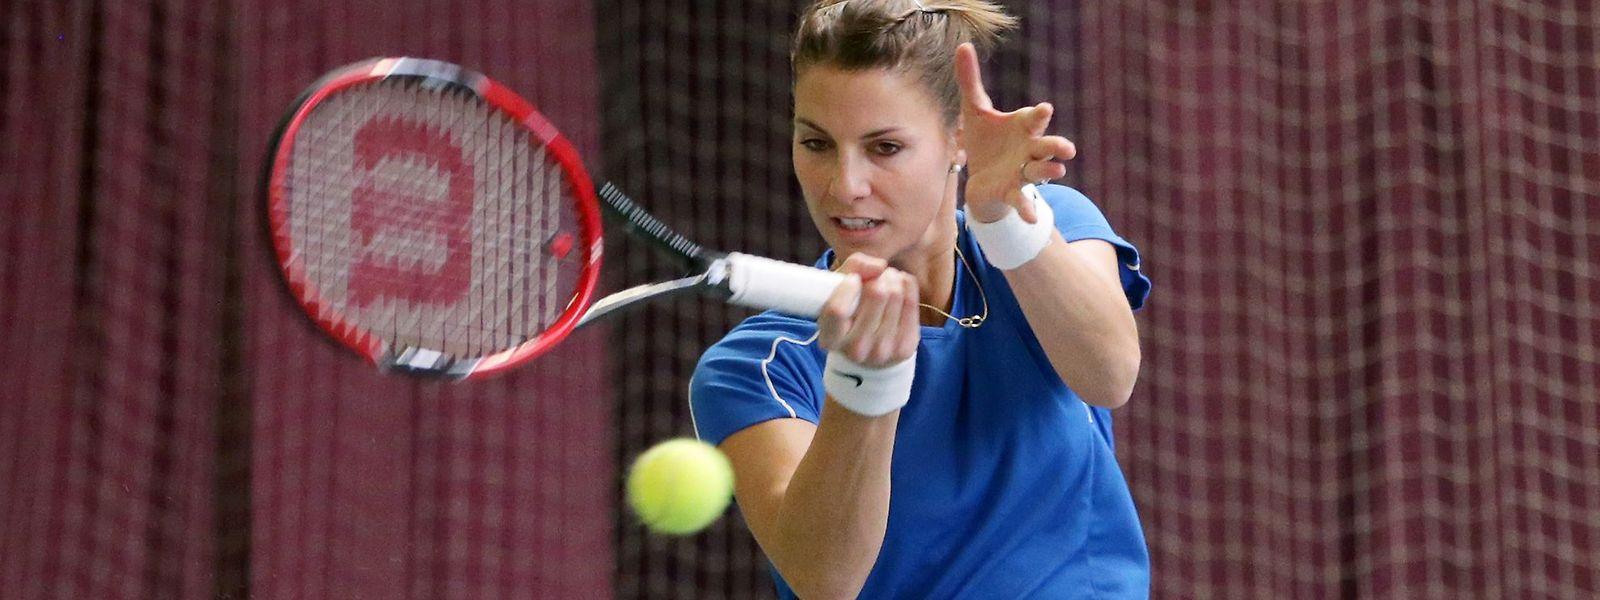 Mandy Minella a souffert pour venir à bout de la coriace Ukrainienne Anastasiya Vasylyeva à Séville